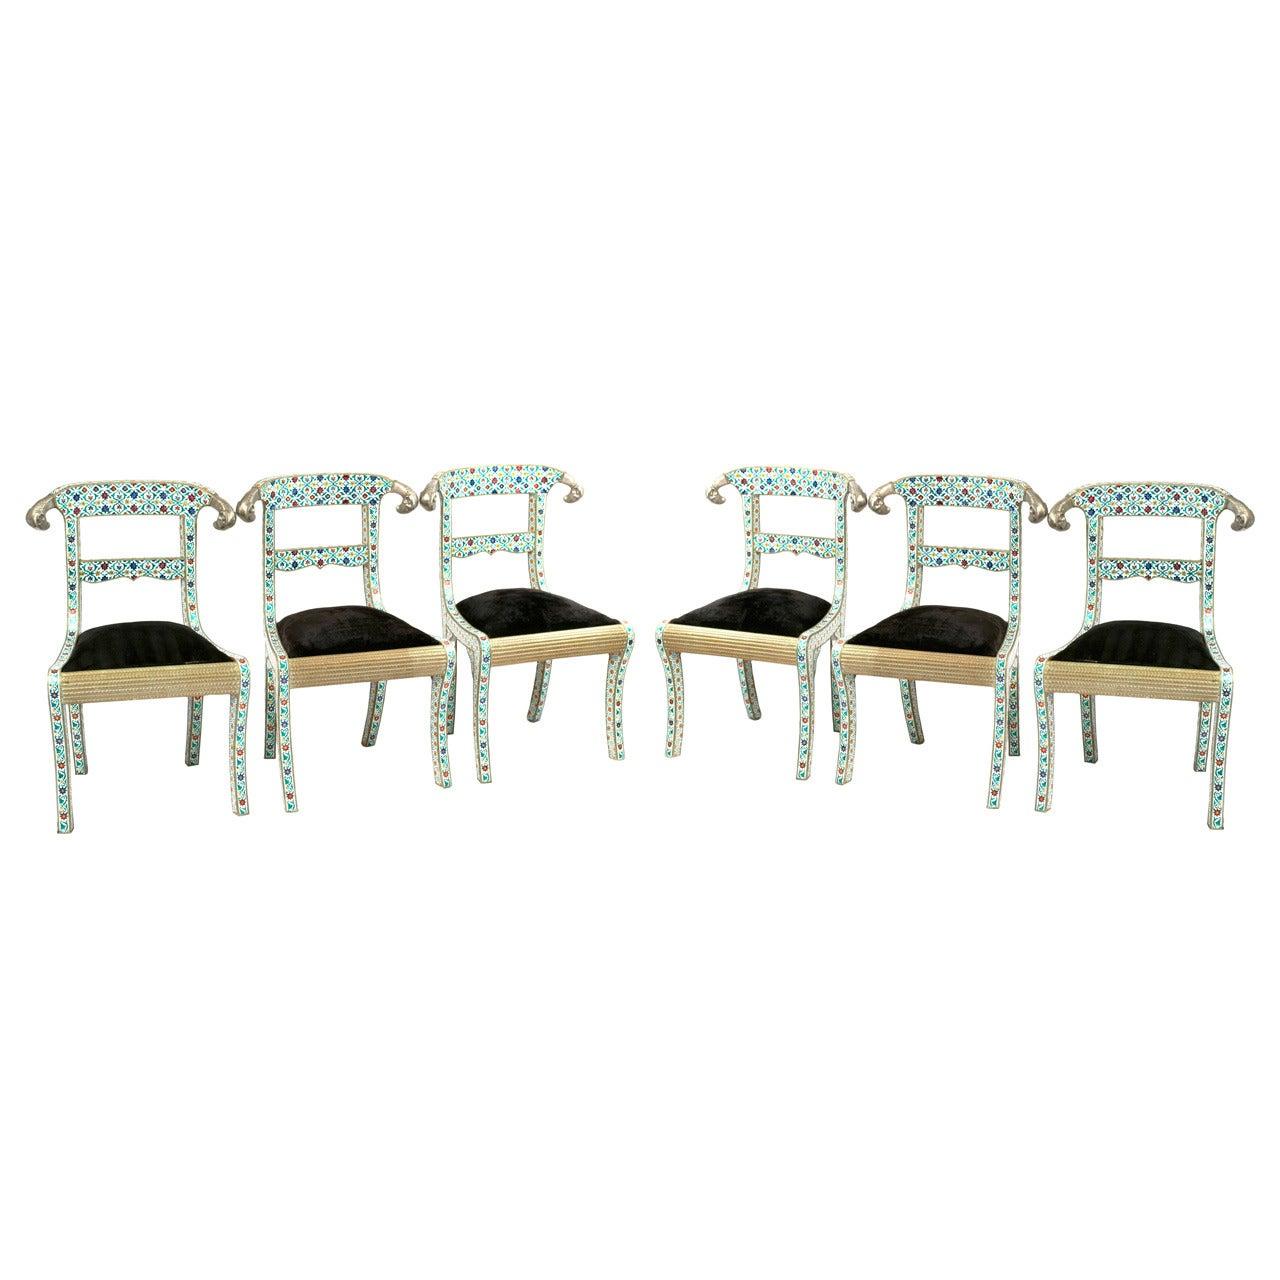 Set of Six Midcentury Indian Enameled Chairs